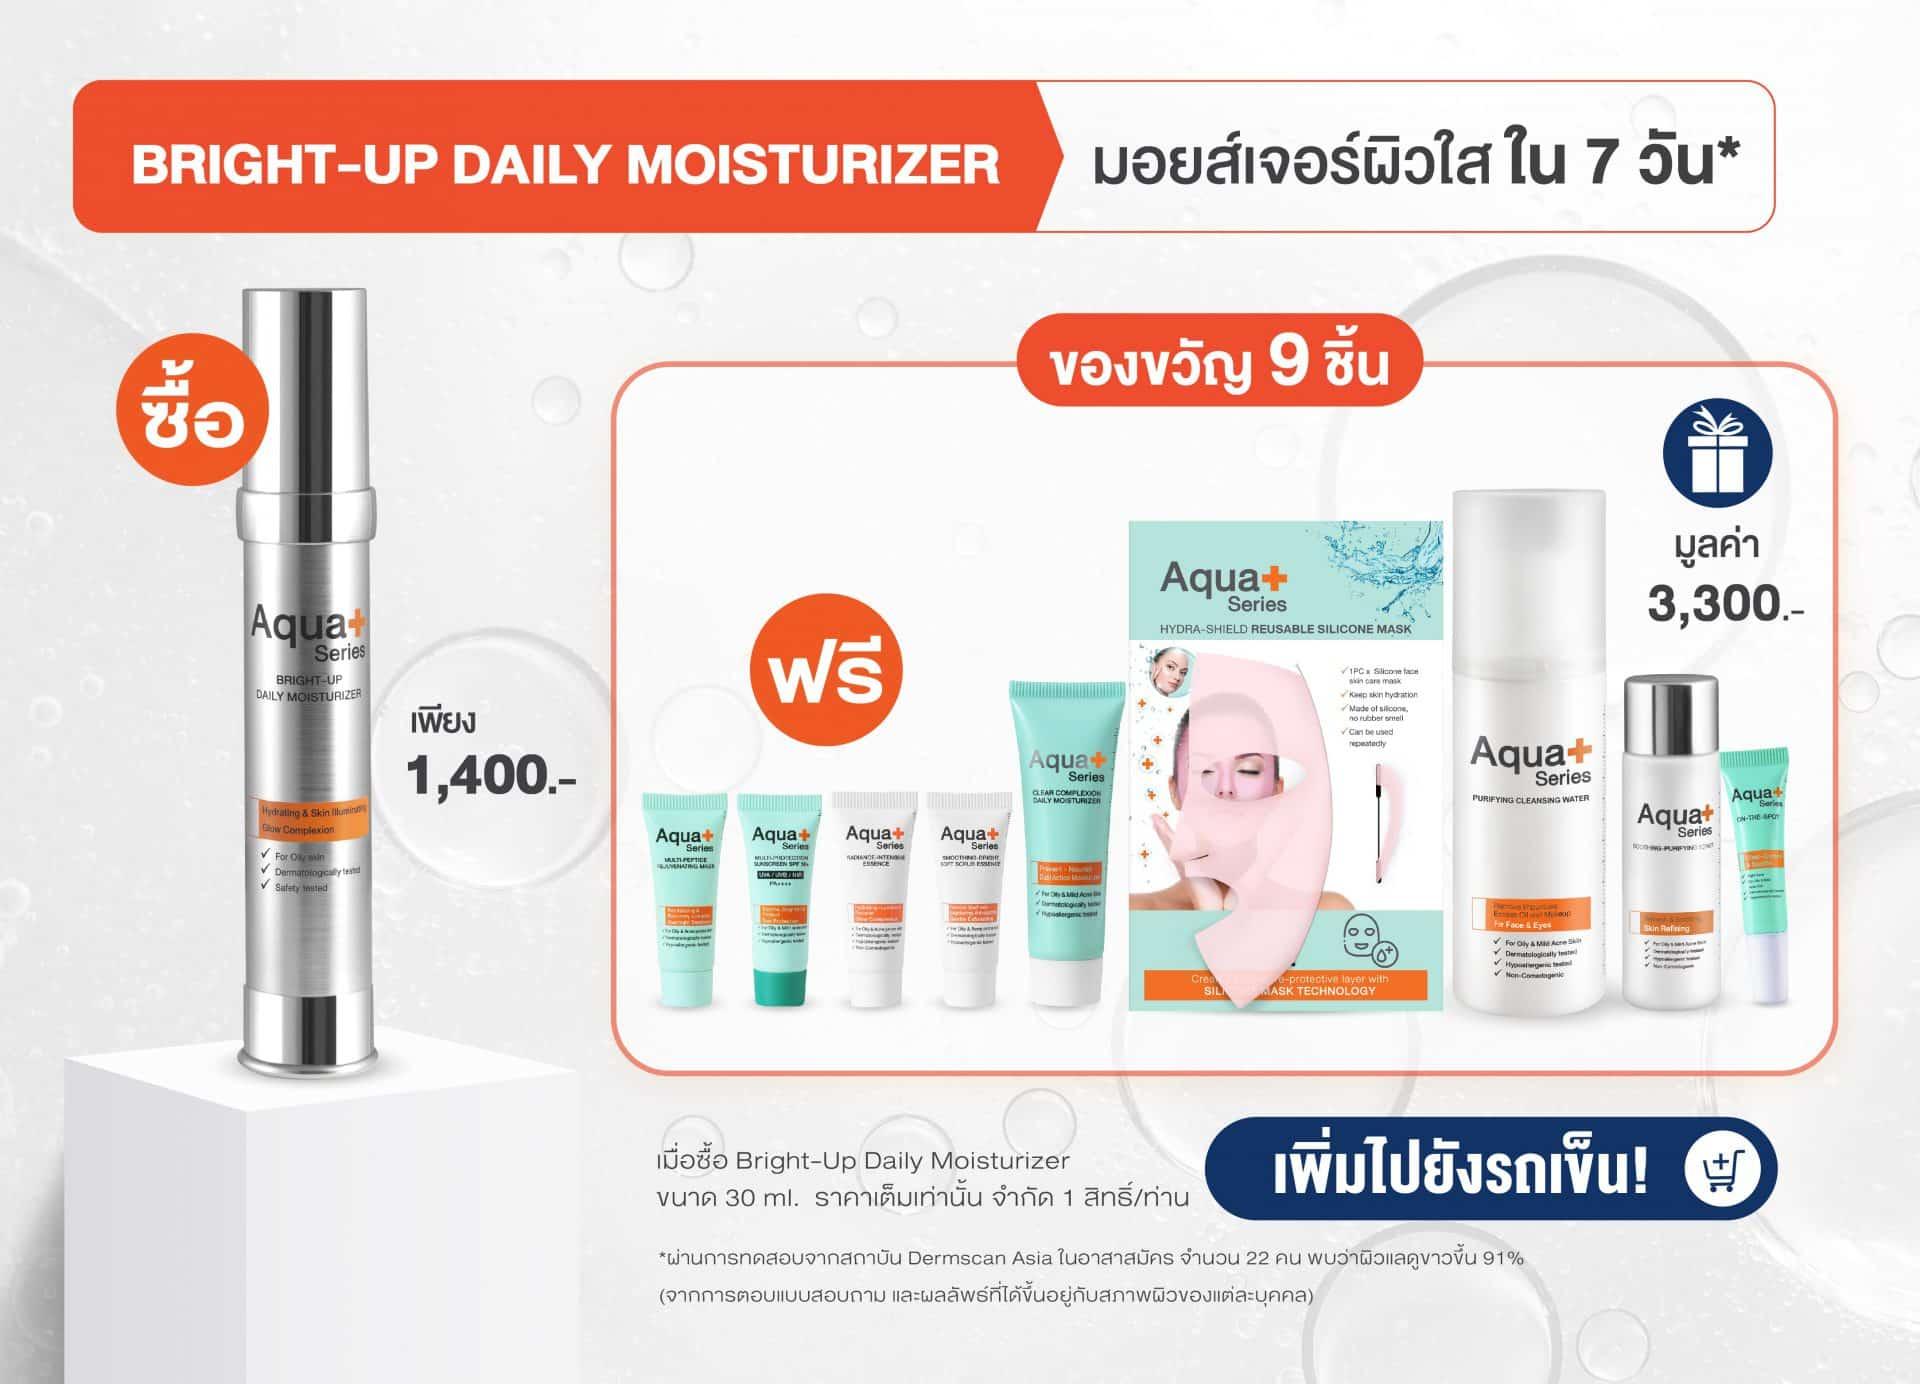 AquaPlus x Shopee 9.9 Super Shopping Day